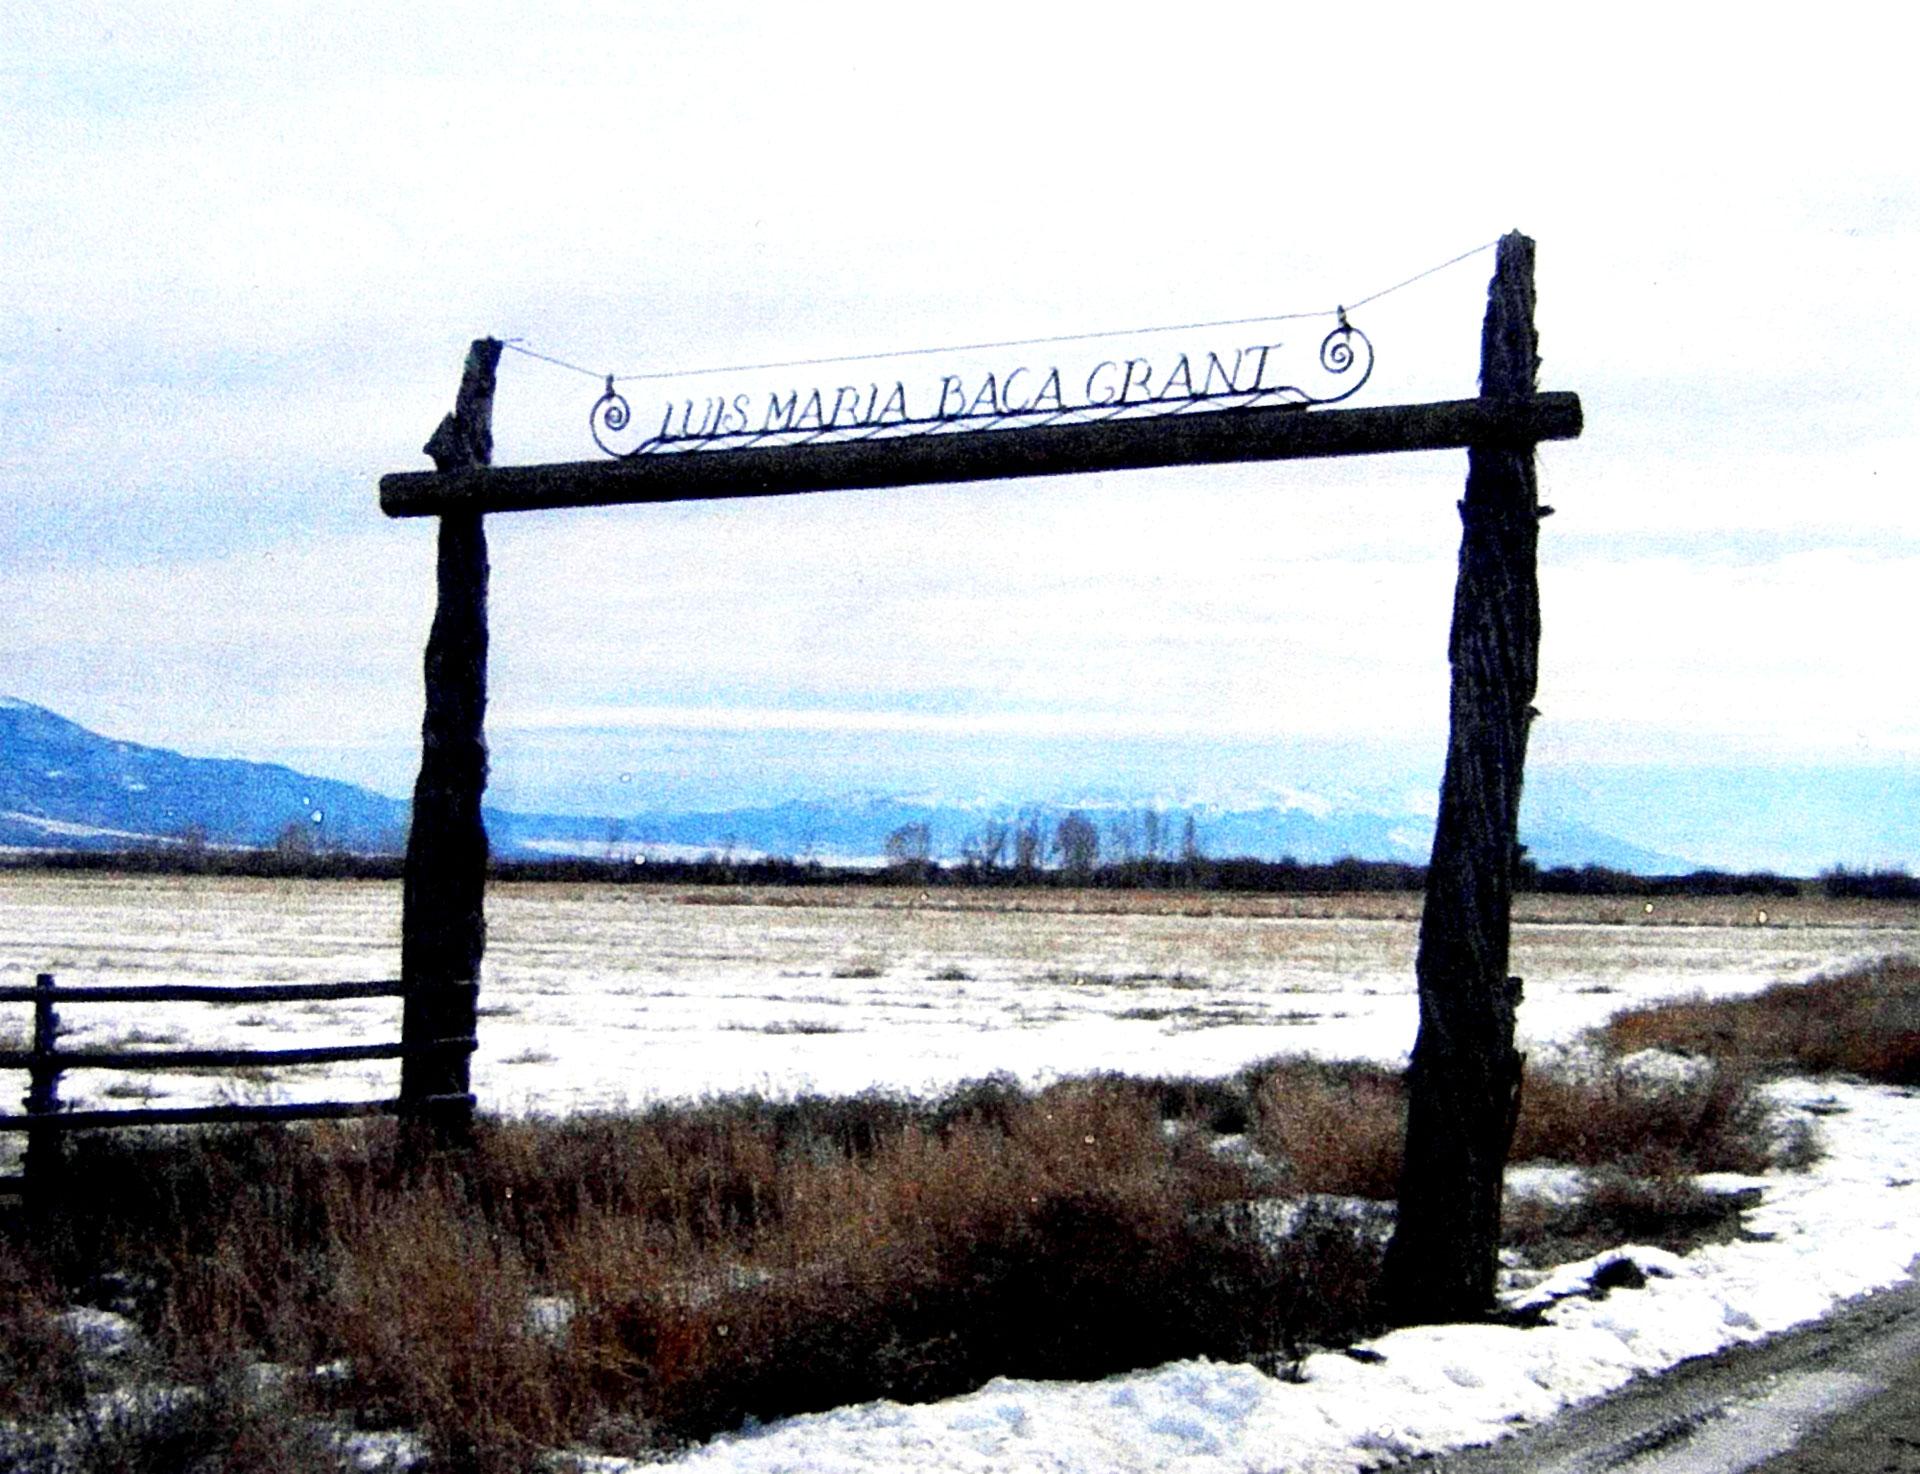 Figure 1. Gateway to the new Baca National Wildlife Refuge